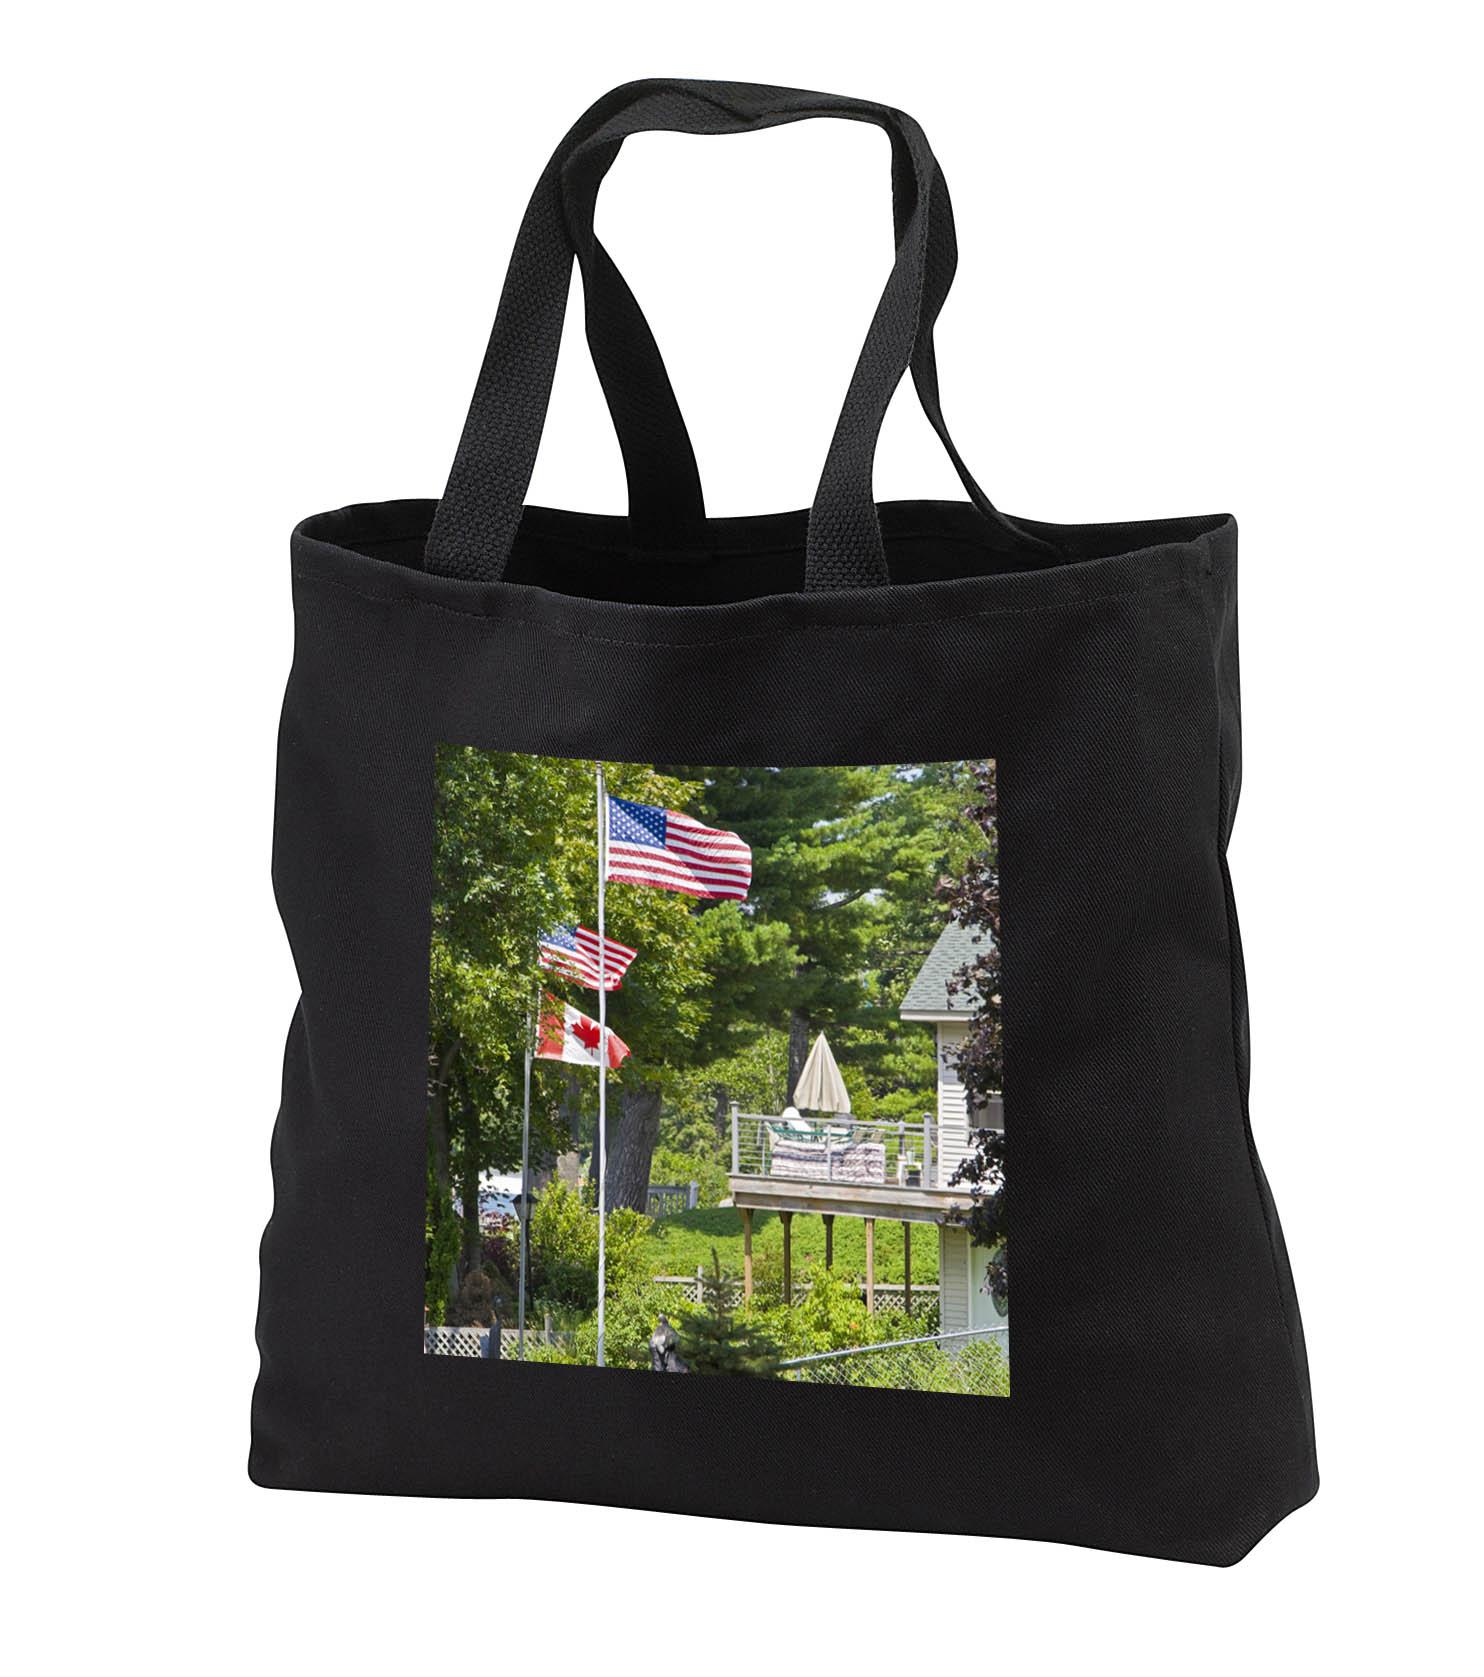 3dRose - Danita Delimont - Flags - New York, American, Canadian flags - US33 BJA0040 - Jaynes Gallery - Tote ...